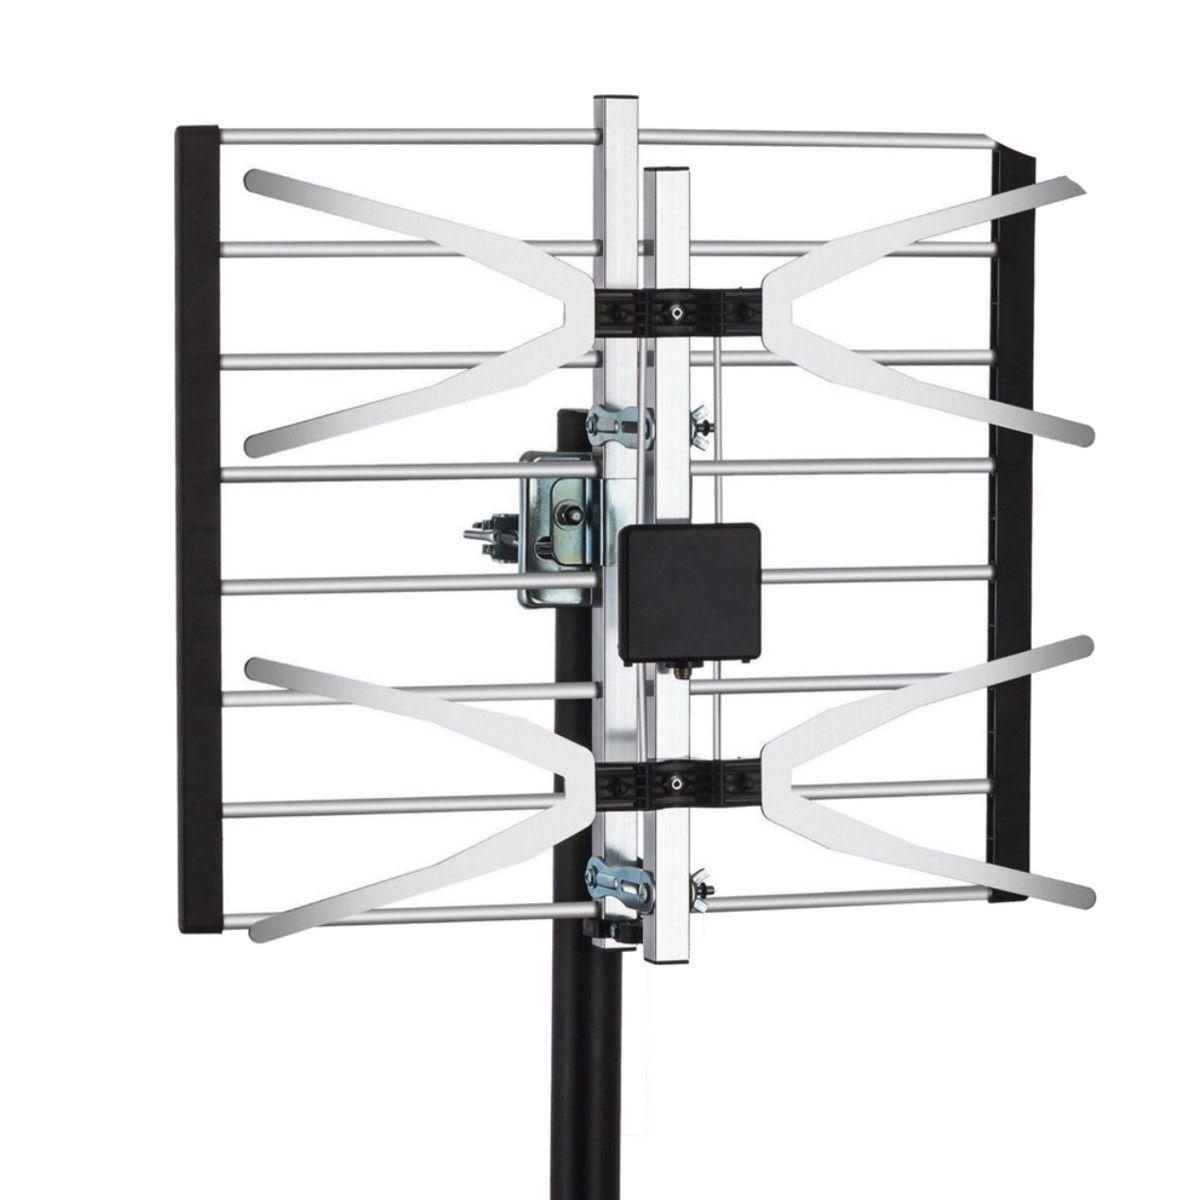 Us 45 91 Yehfly Tlpa16b 120 Miles Digital Amplified Signal Tv Aerial Antenna Home Audio Video From Electronics On Banggood Com Tv Aerials Digital Laos